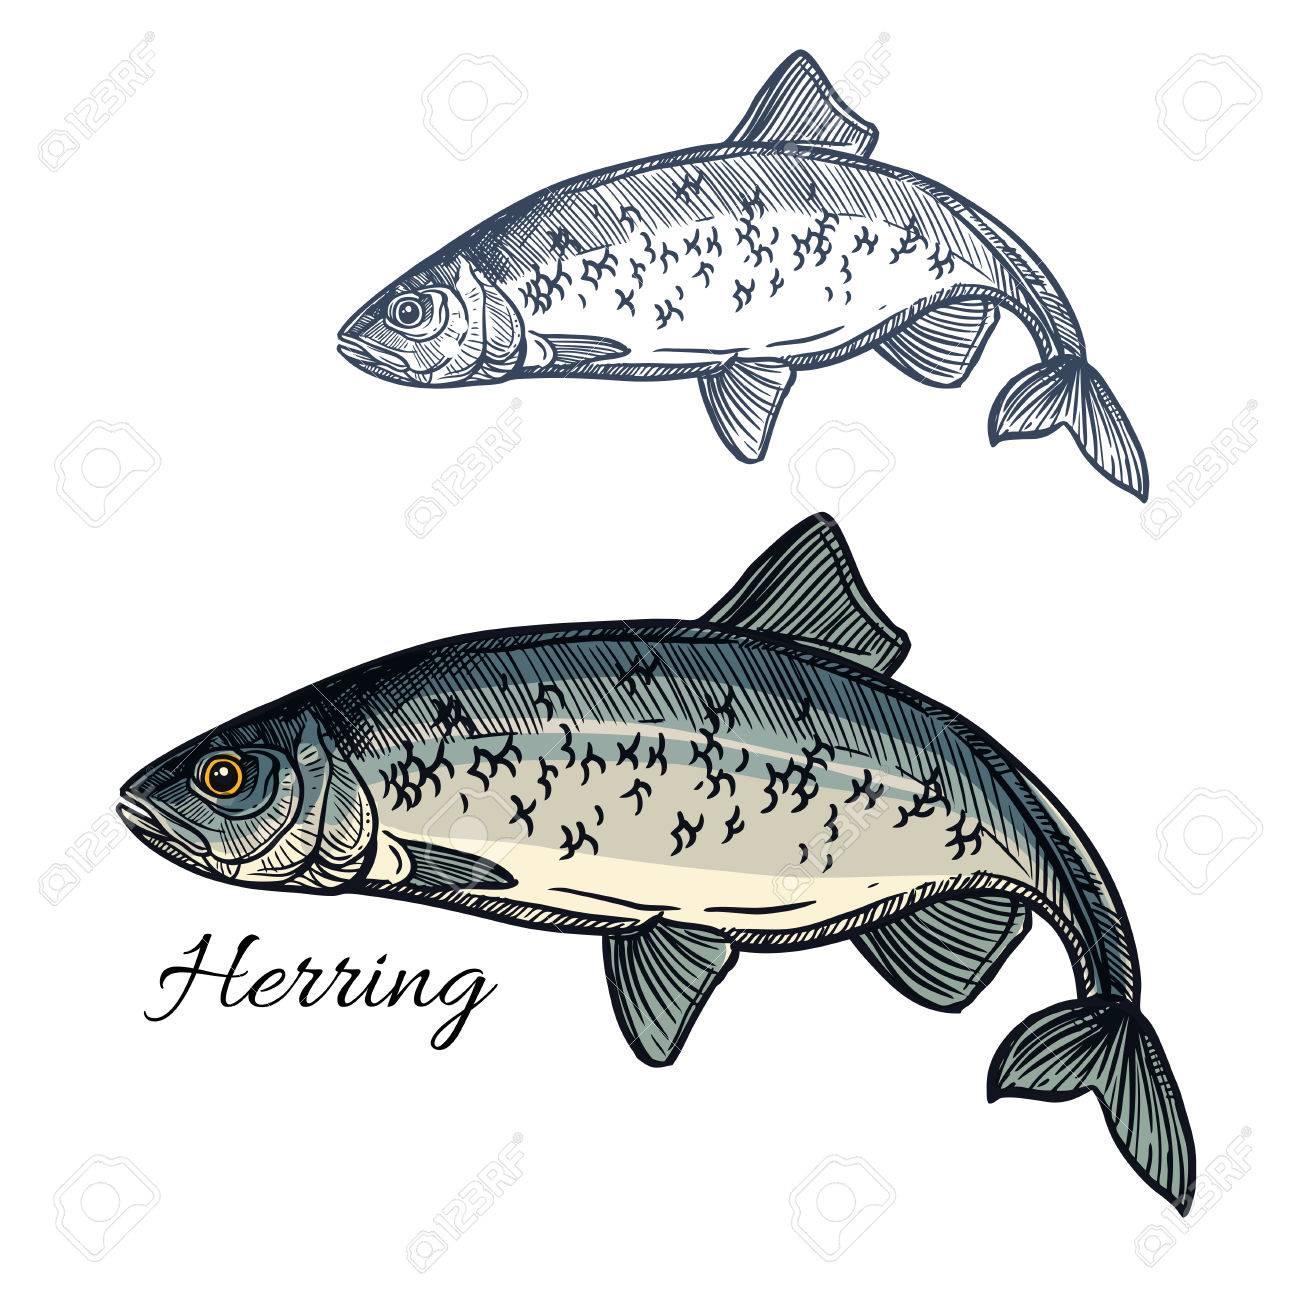 Herring Sketch Fish Icon Isolated Marine Atlantic Ocean Sardine Or